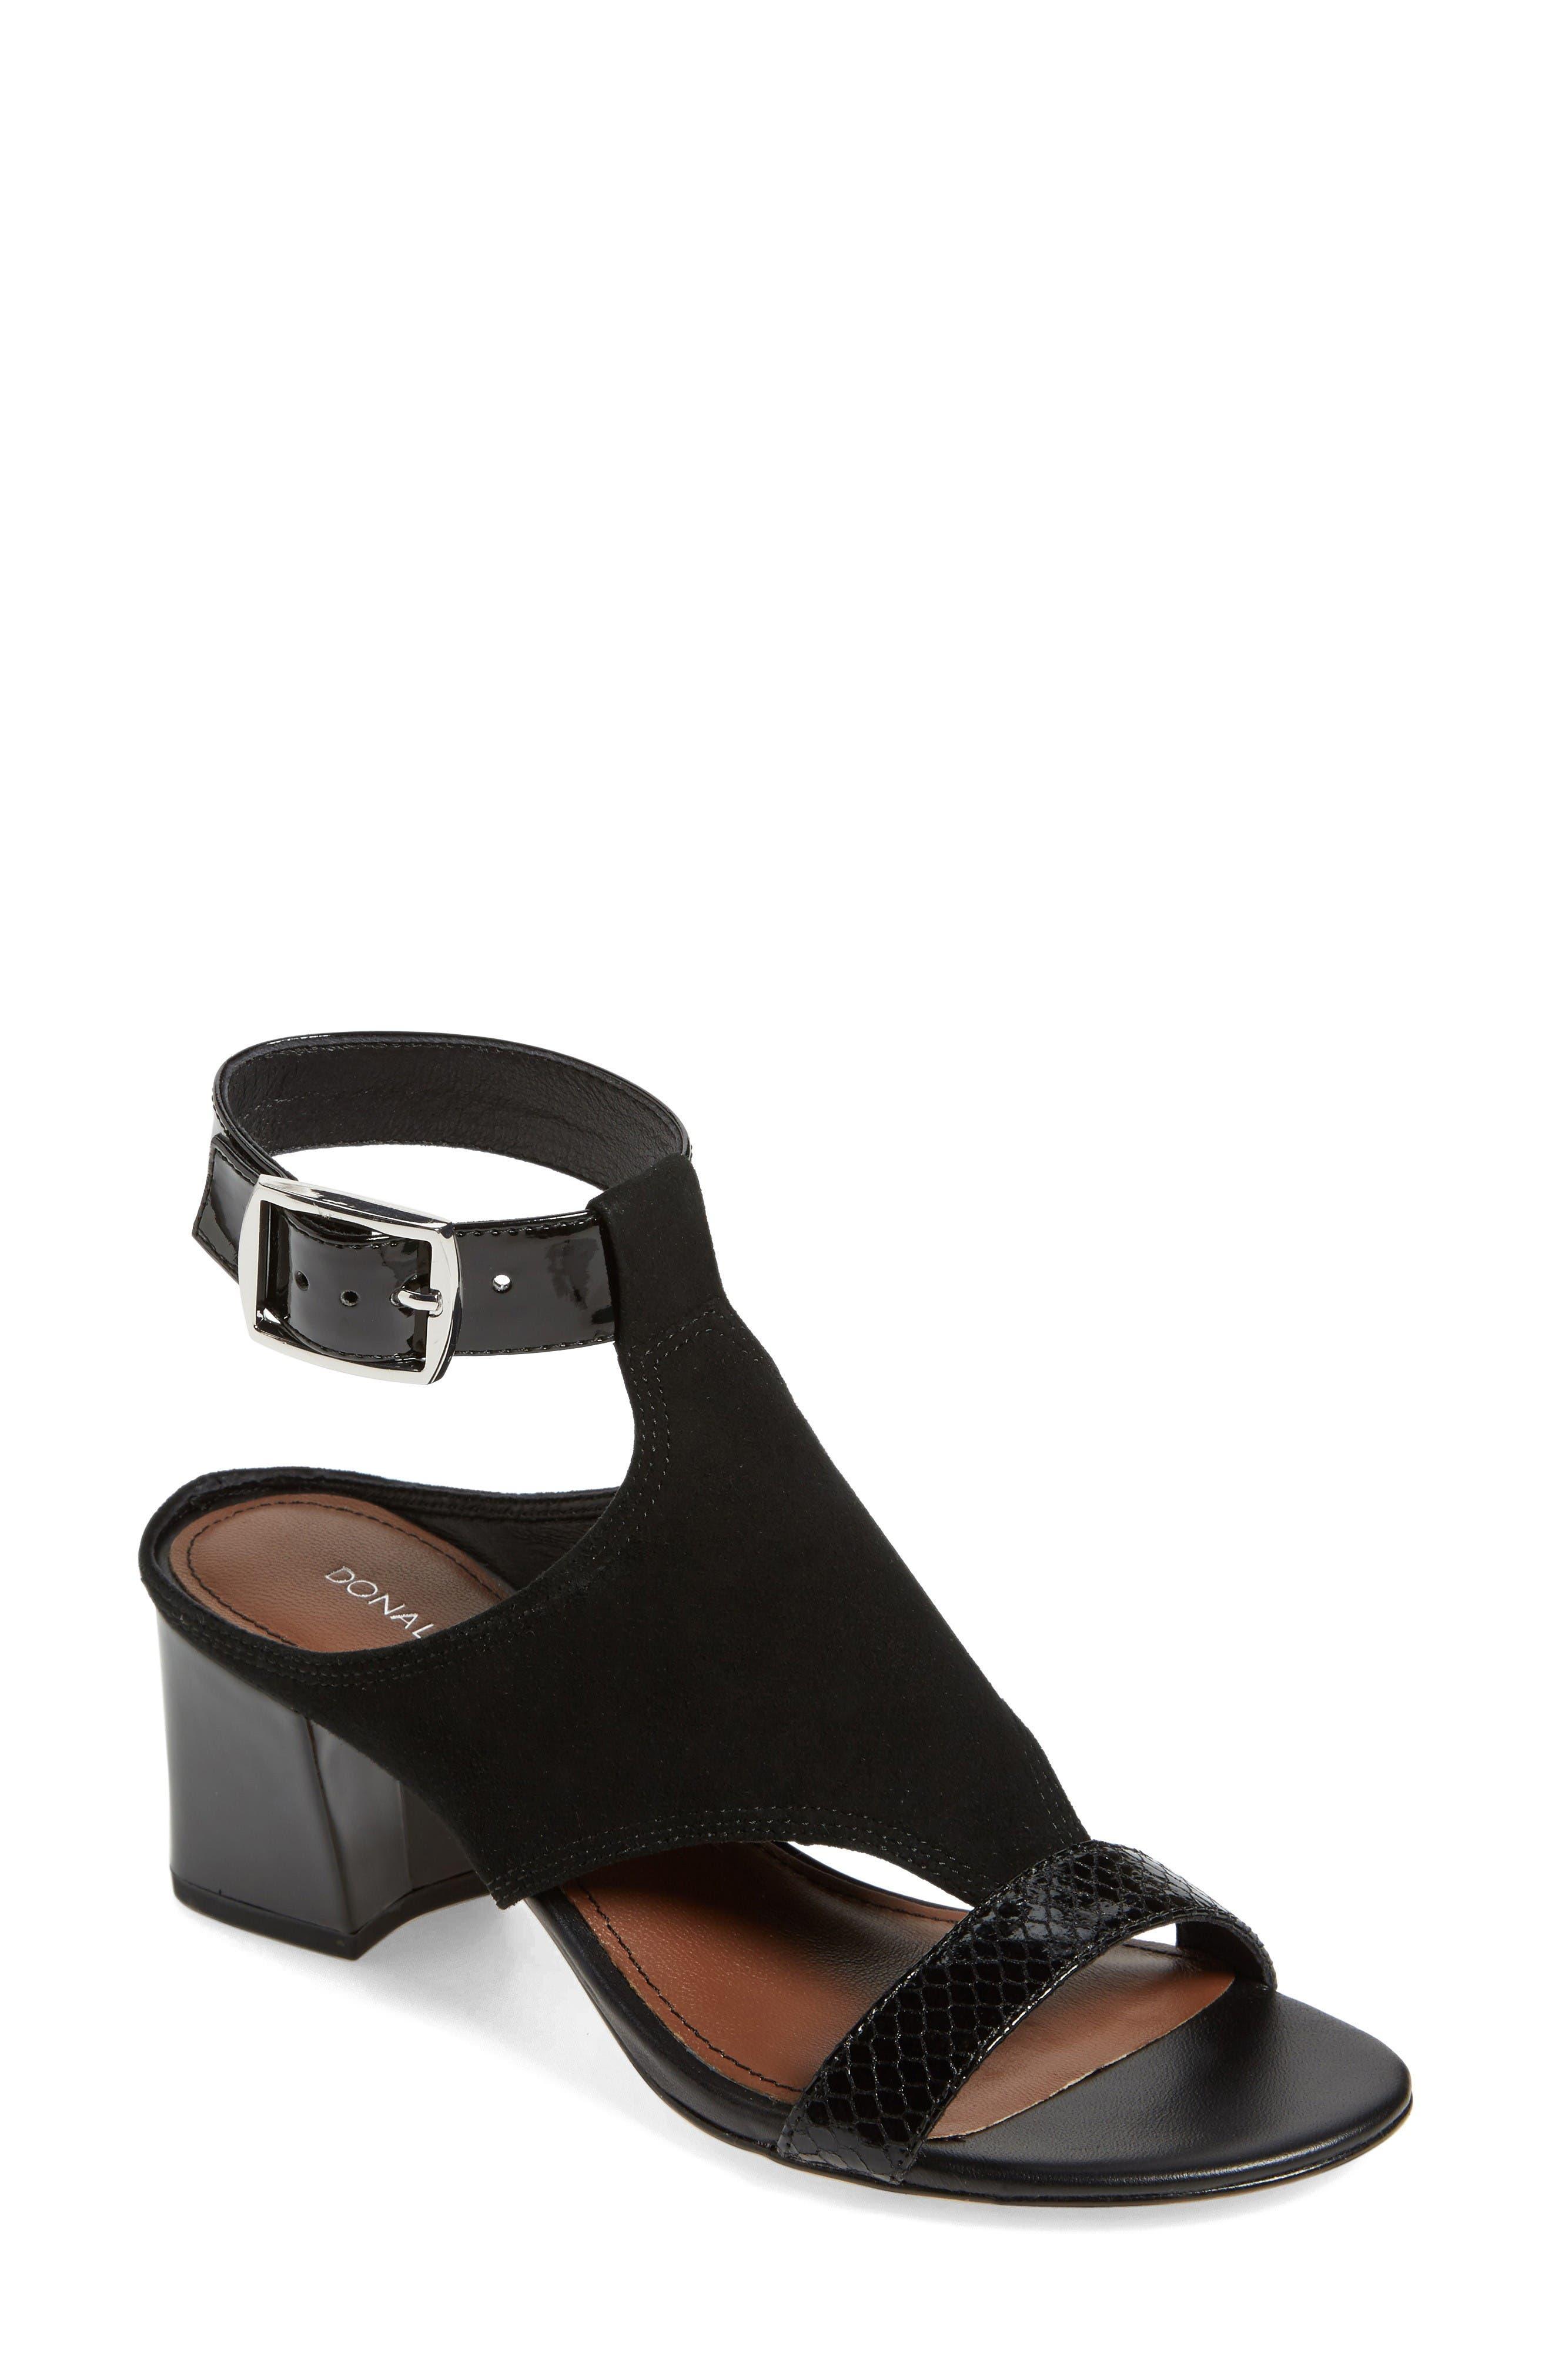 Main Image - Donald J Pliner Ellee Block Heel Sandal (Women)